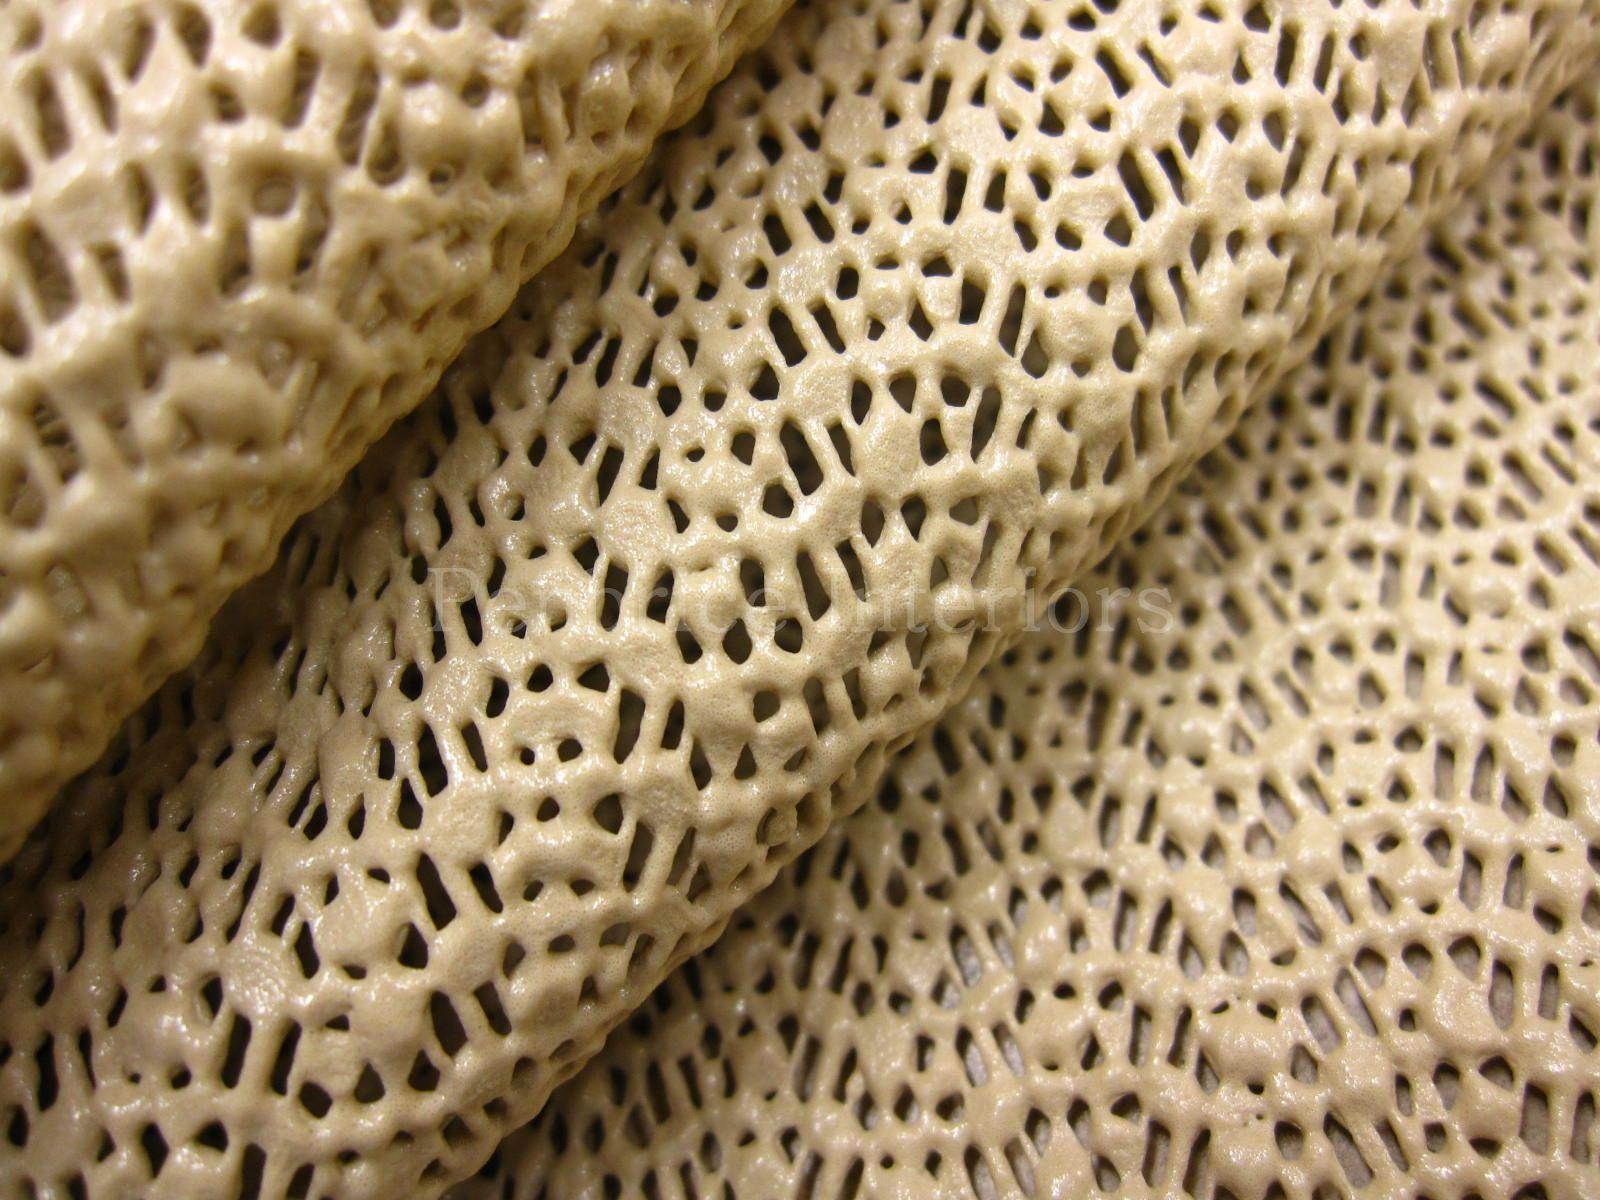 Anti slip cloth SOFA SEAT CUSHIONS SLIP TRY THIS RUBBER GRIP FABRIC